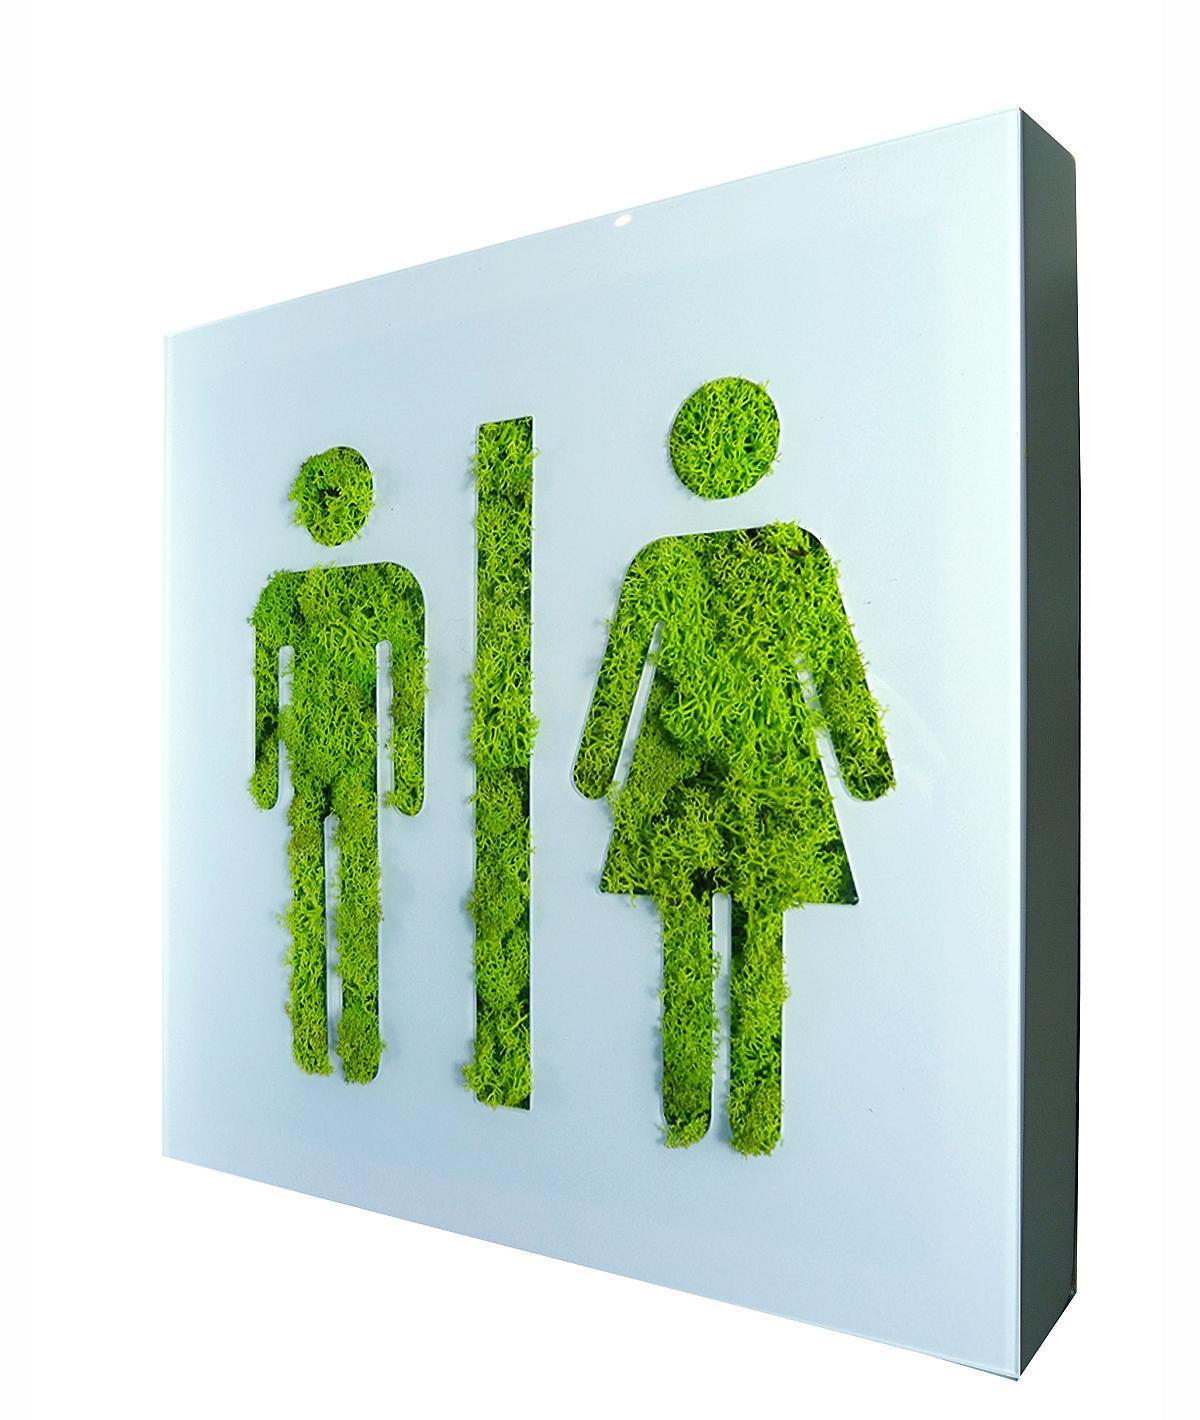 Flowerbox toilettes tableau v g tal for Fabriquer cadre vegetal mural